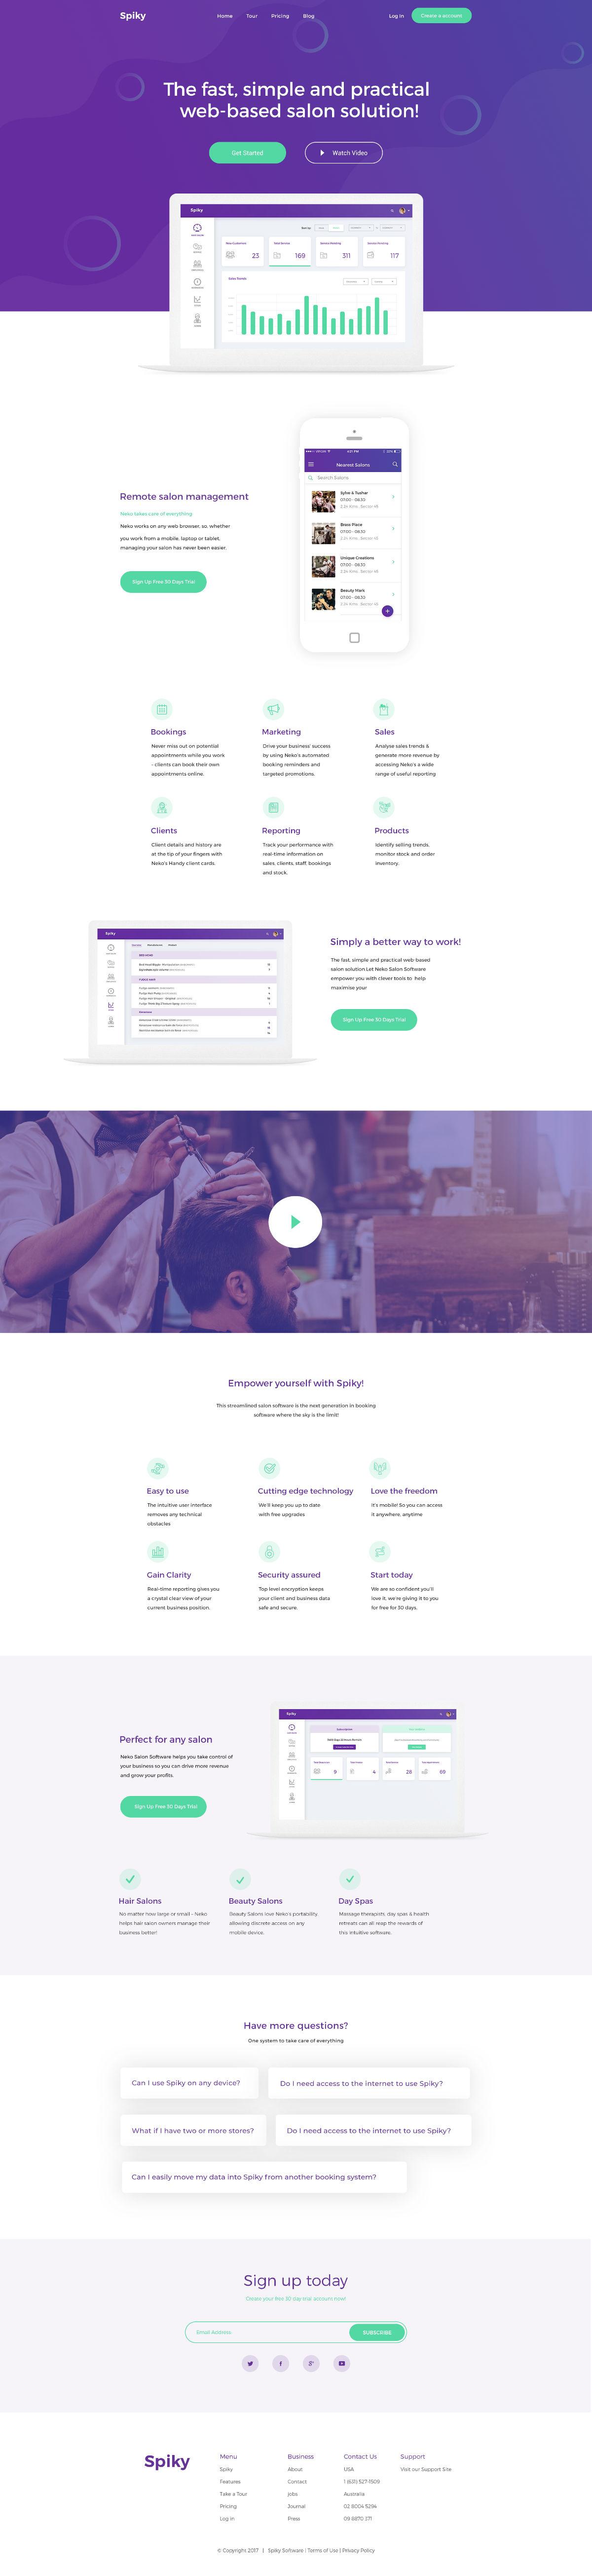 Free Spiky Salon Software Landing Page PSD